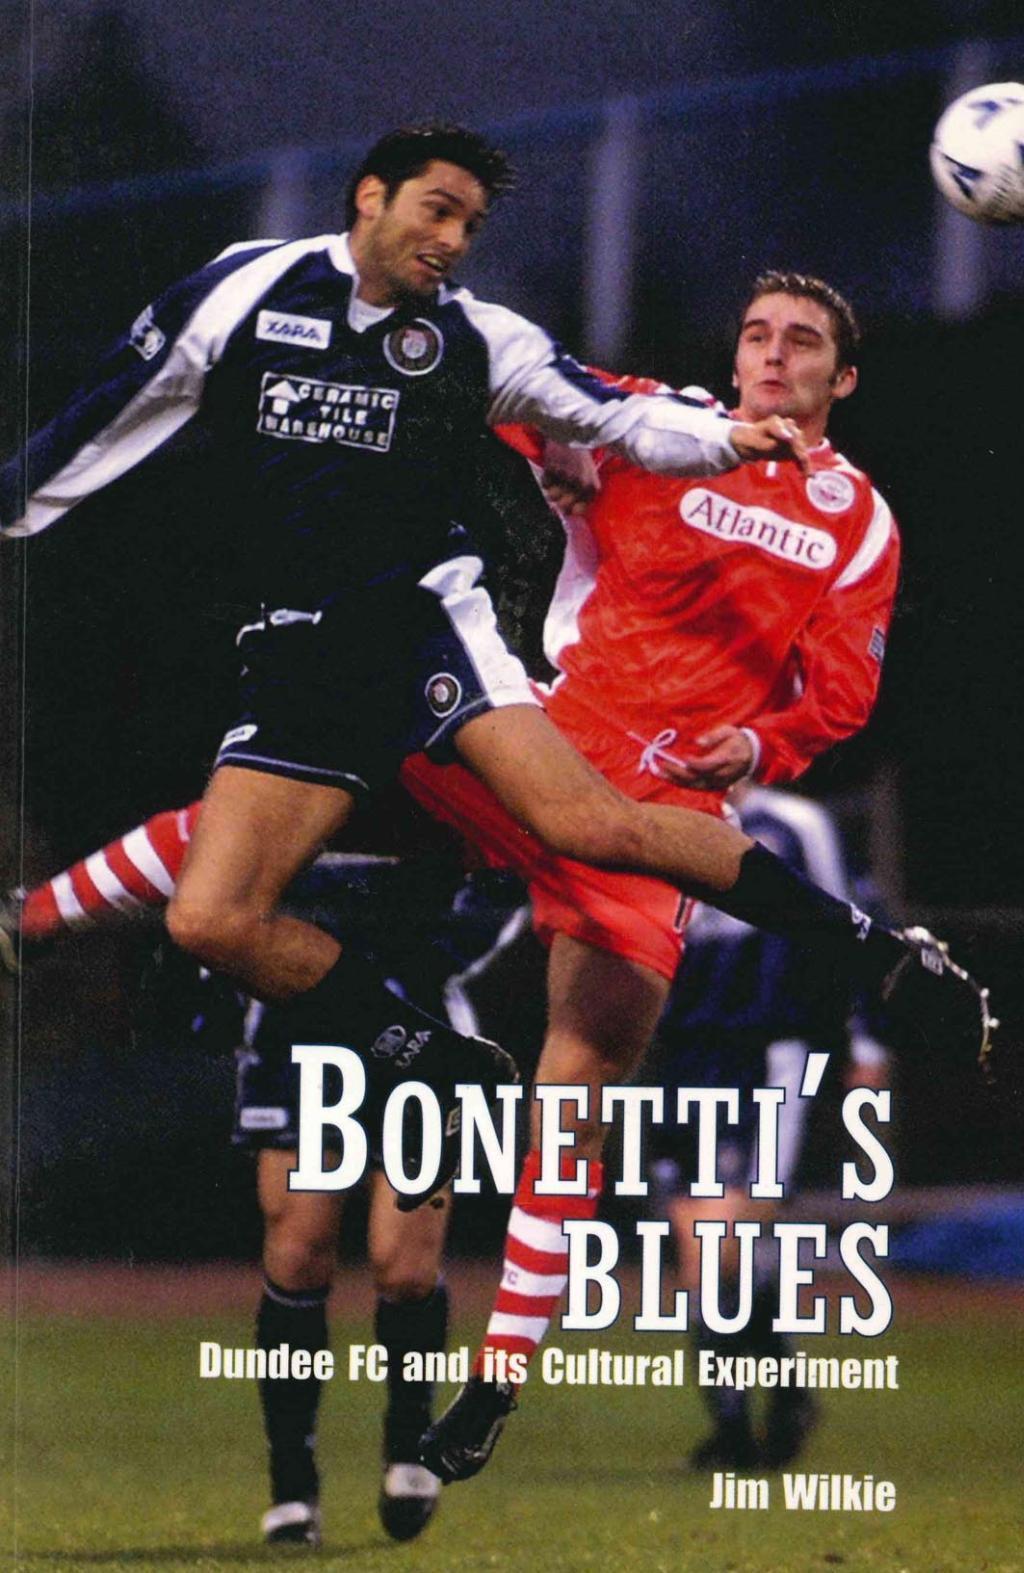 Bonetti's Blues